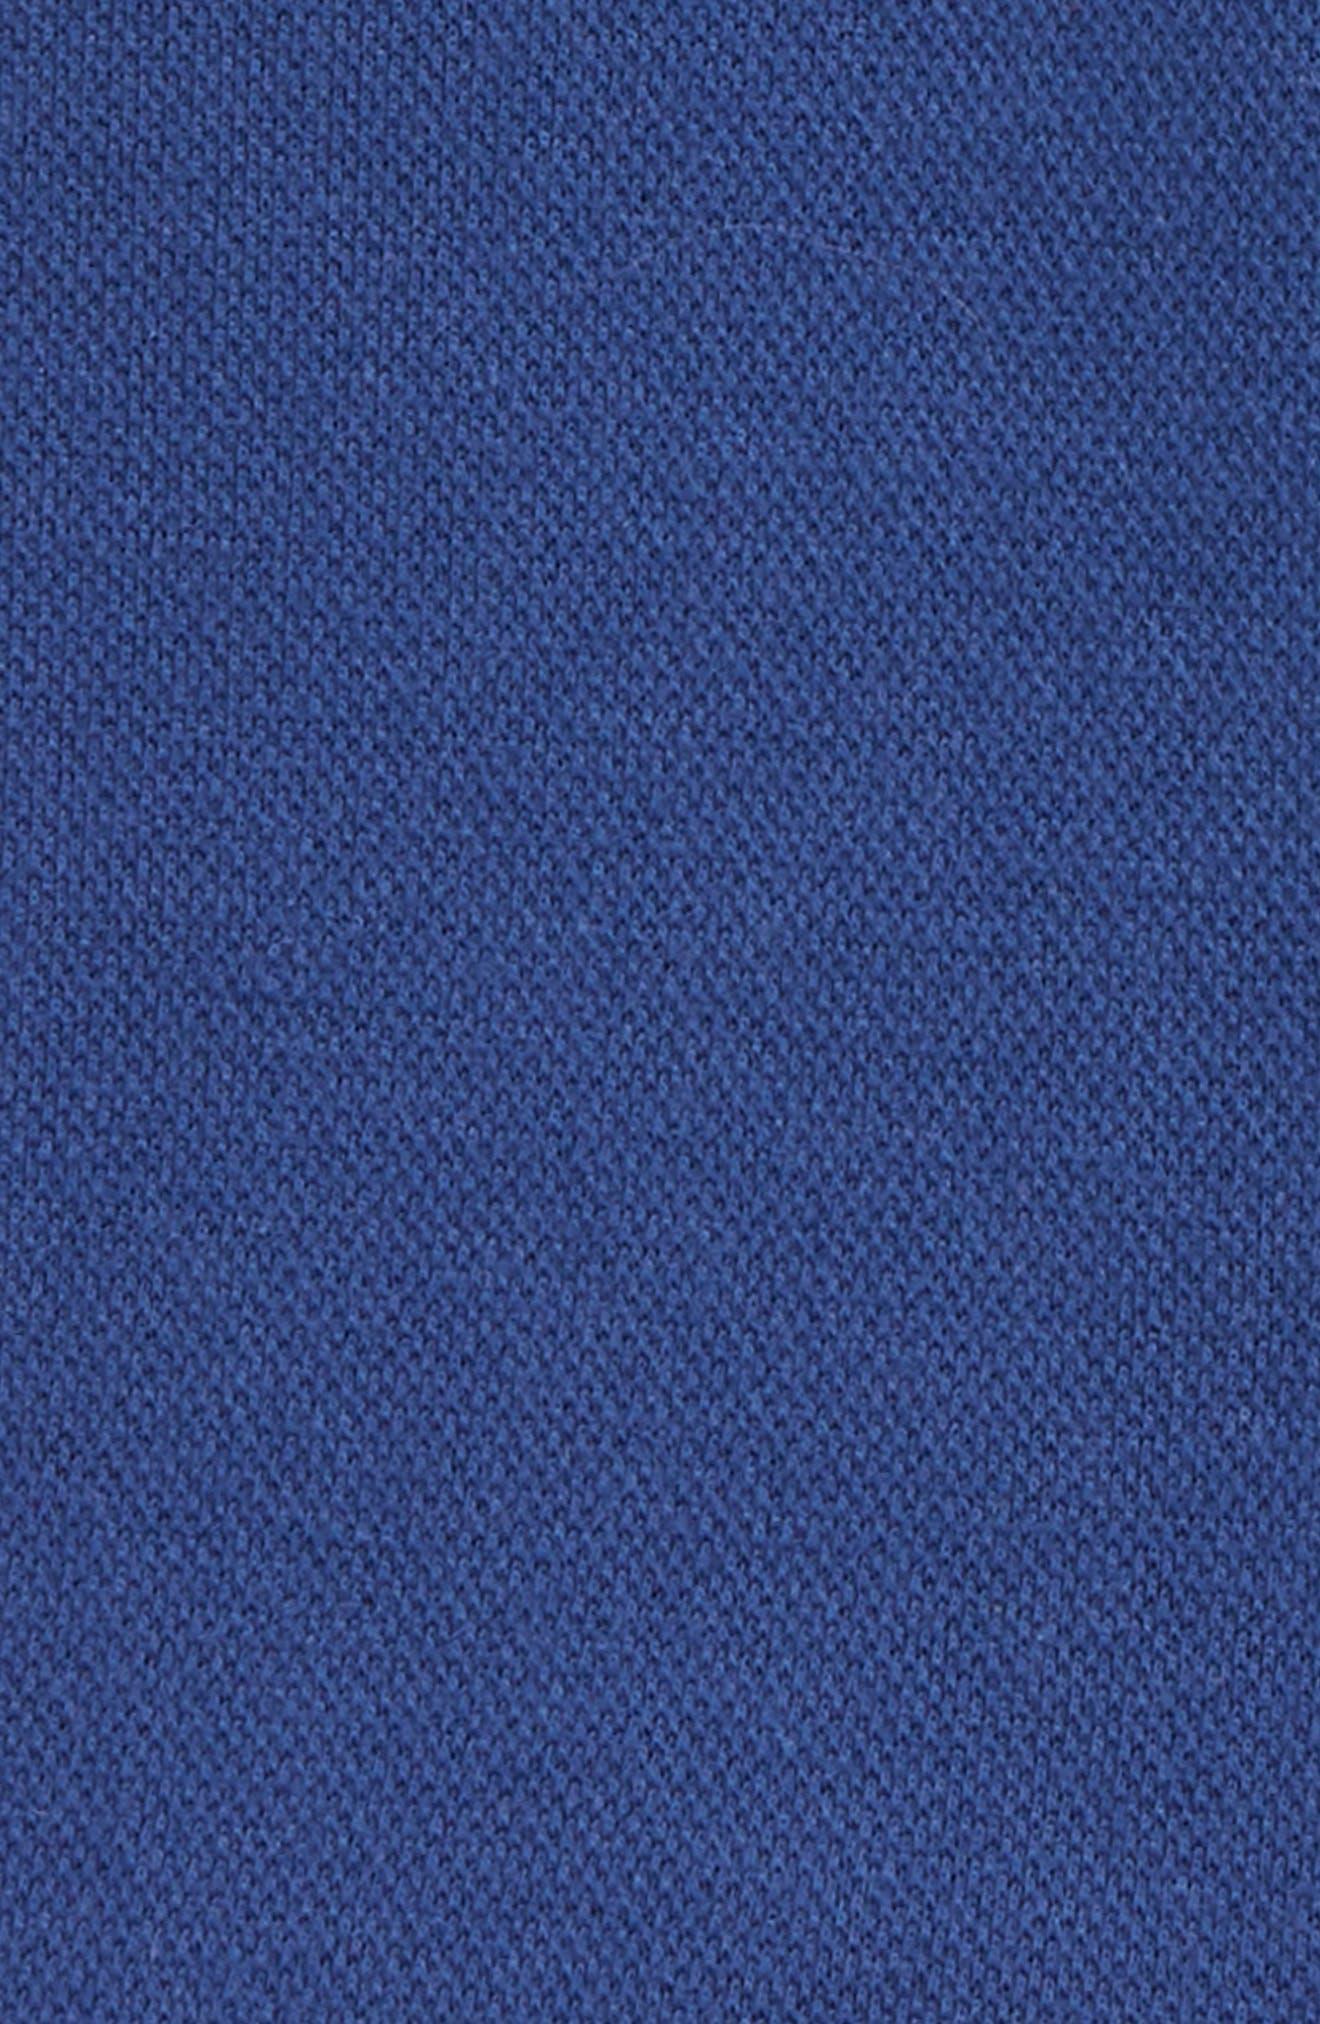 Jersey Chino Shorts,                             Alternate thumbnail 3, color,                             Beacon Blue